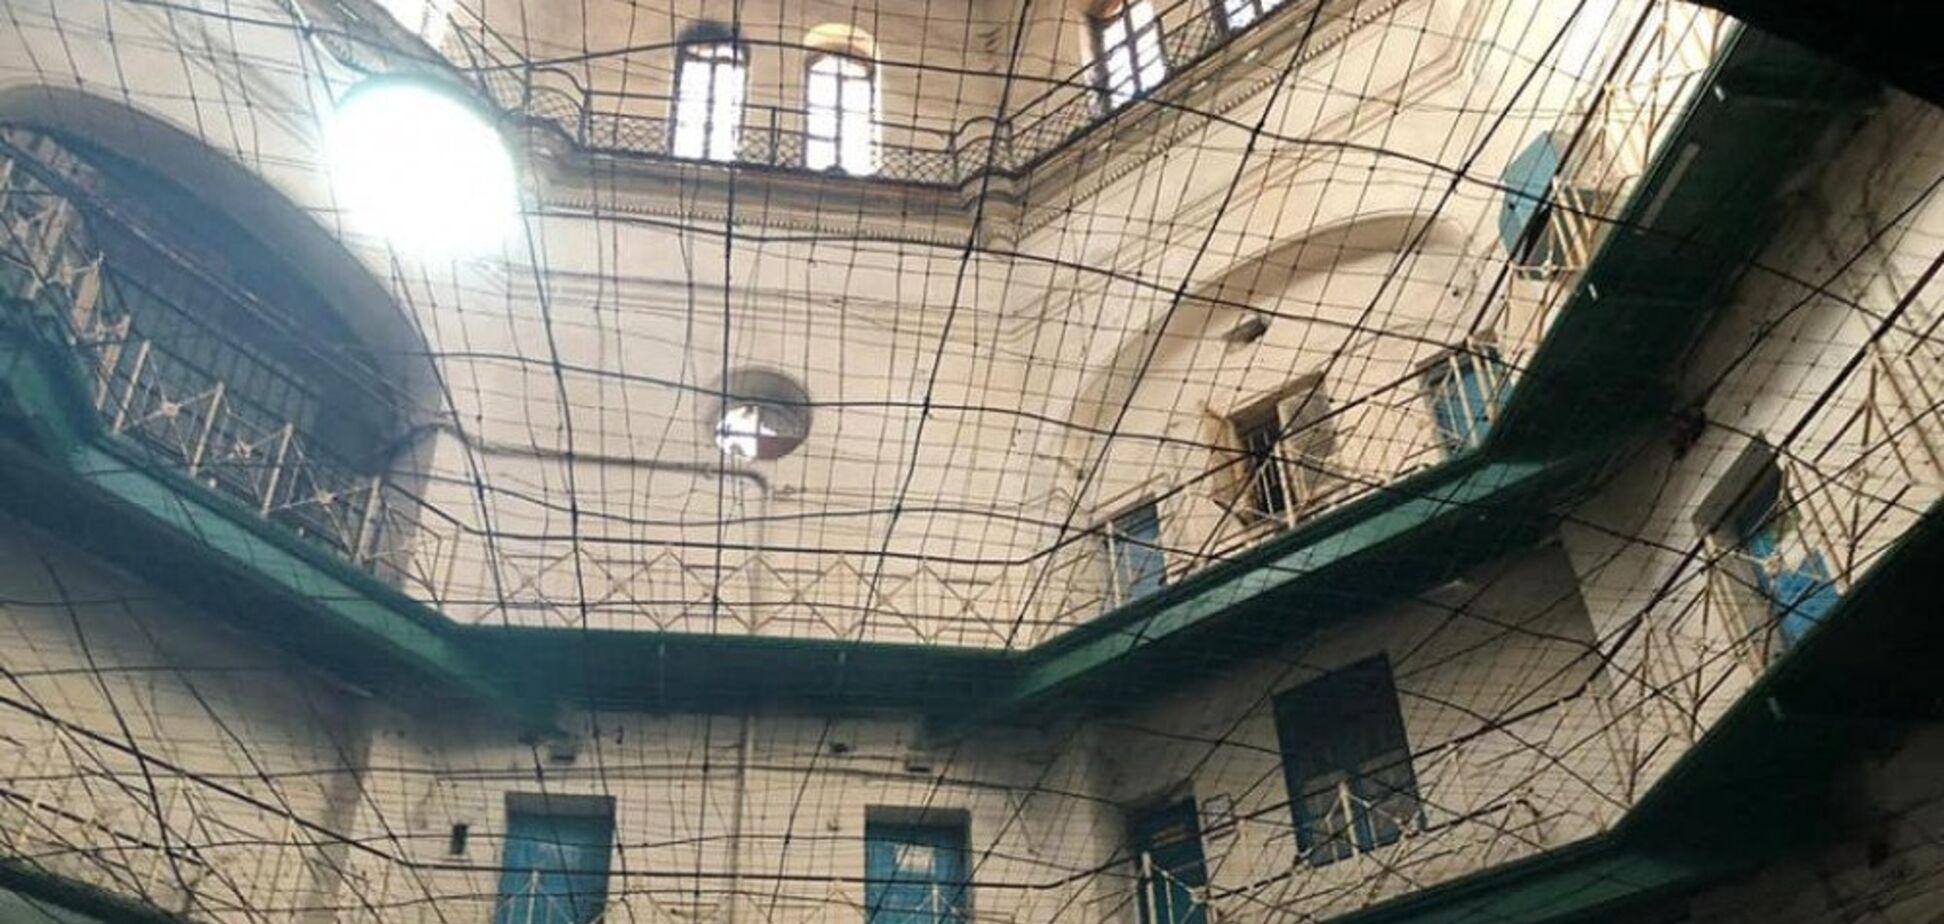 Сотрудник одесского СИЗО продавал наркотики заключенным